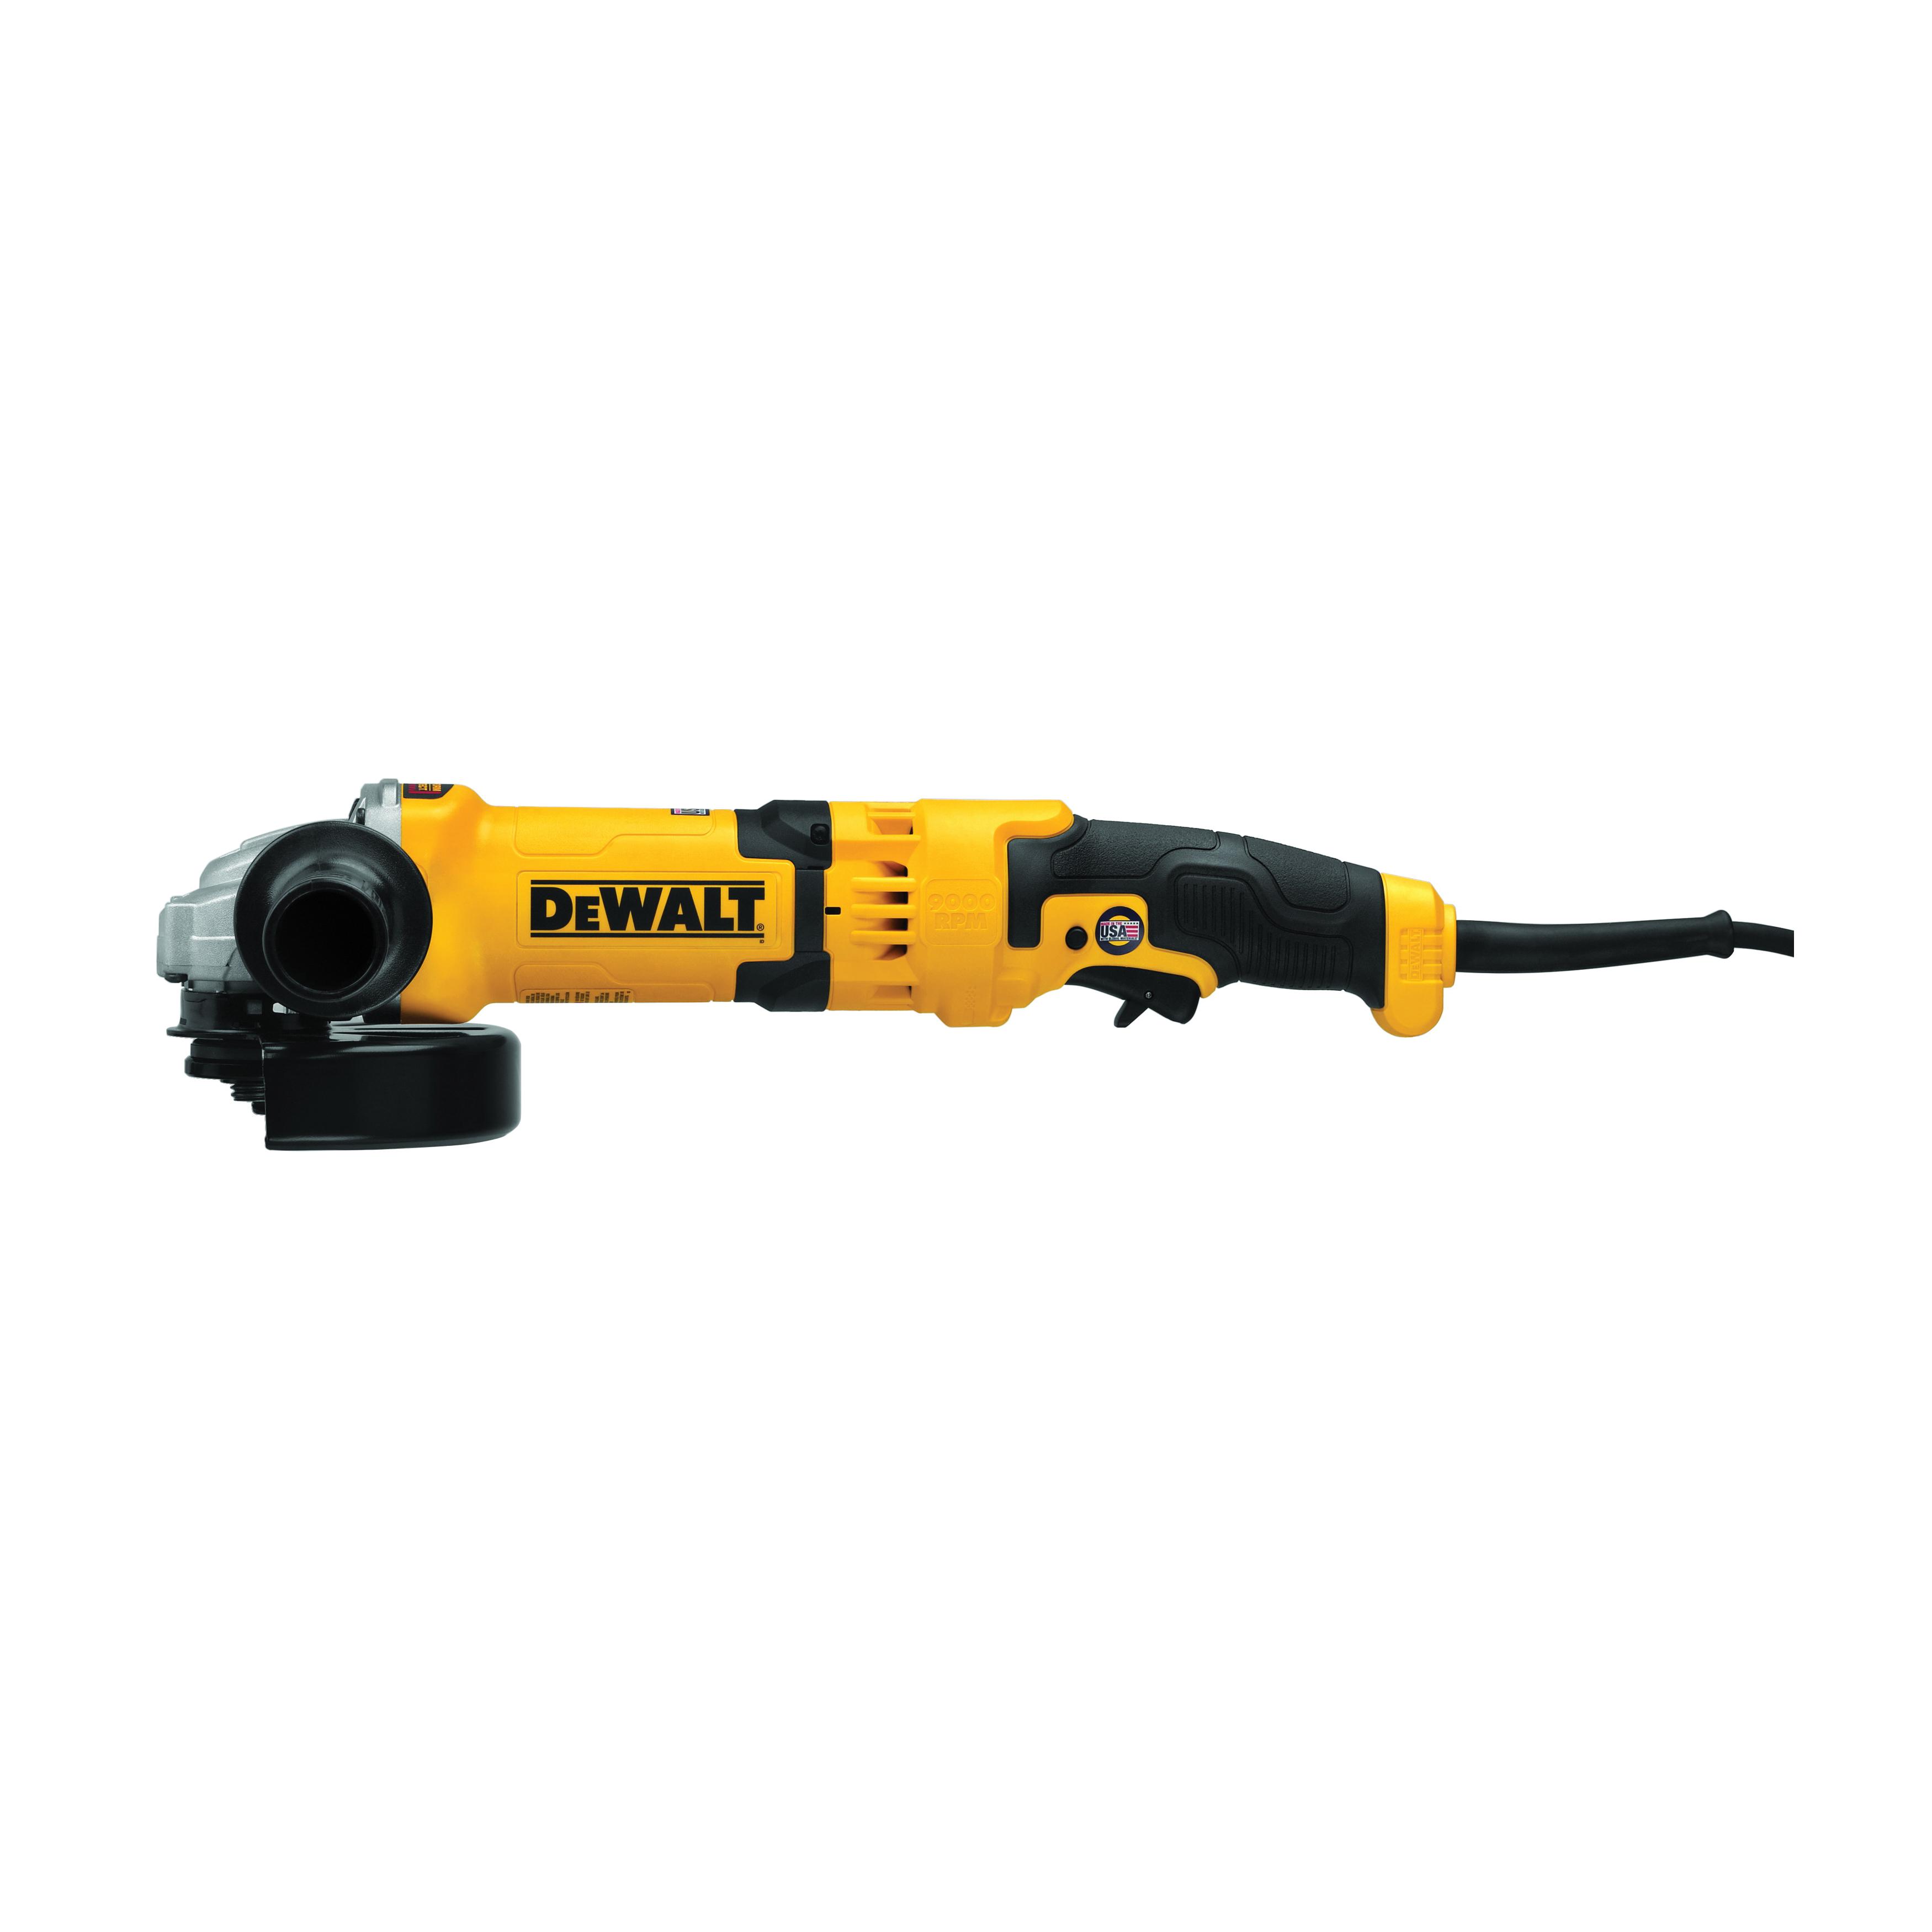 DeWALT® DWE43066 Heavy Duty High Performance Small Angle Grinder, 6 in Dia Wheel, 5/8-11 Arbor/Shank, 120 VAC, Black/Yellow, Yes, Trigger Switch